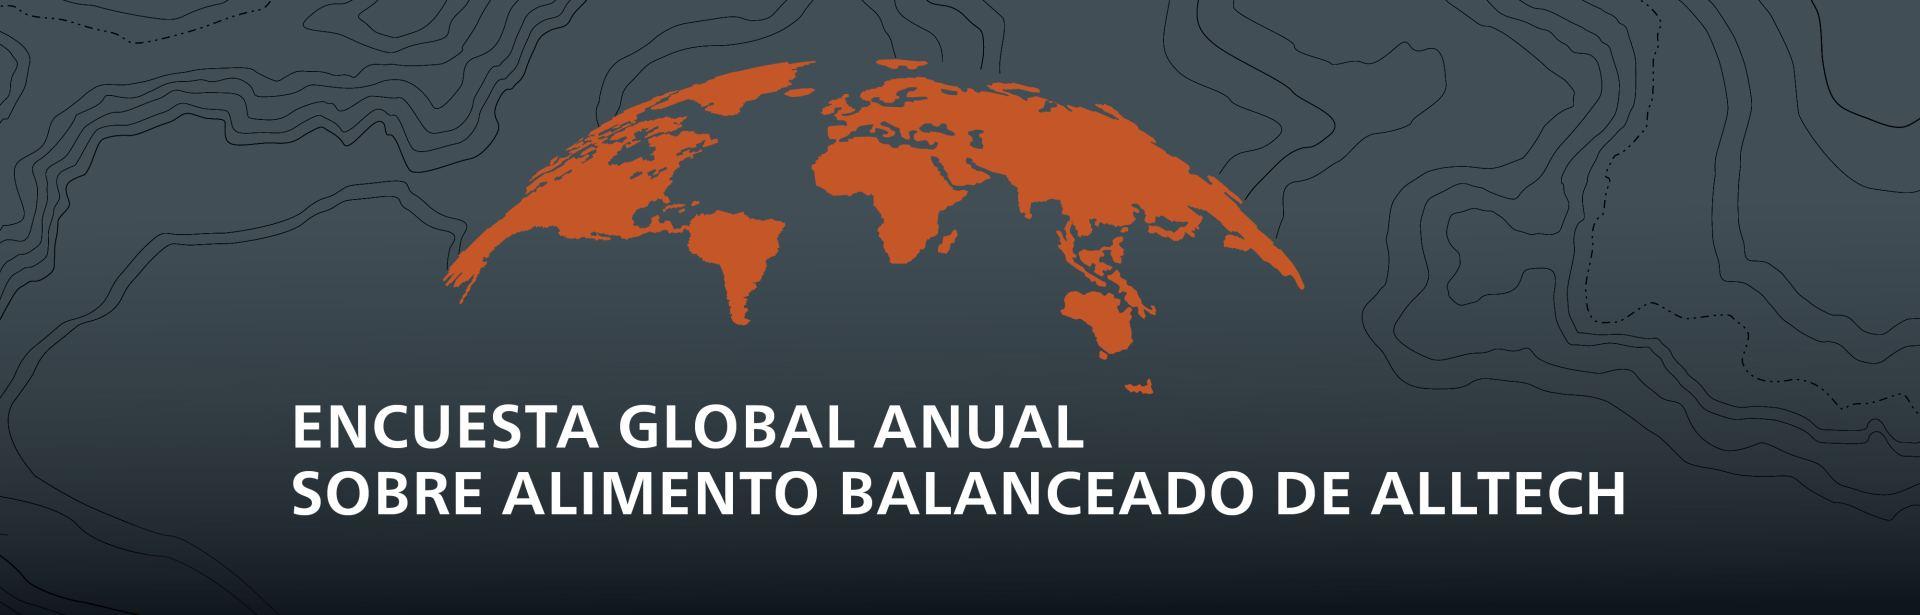 Encuesta Global Anual sobre Alimento Balanceado de Alltech